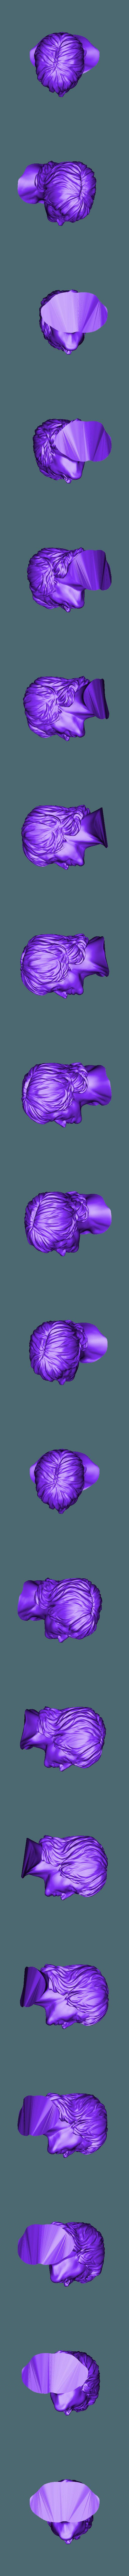 TSOY.stl Download free STL file Victor TSOY bust (Виктор Цой Бюст) • 3D printable template, Boris3dStudio